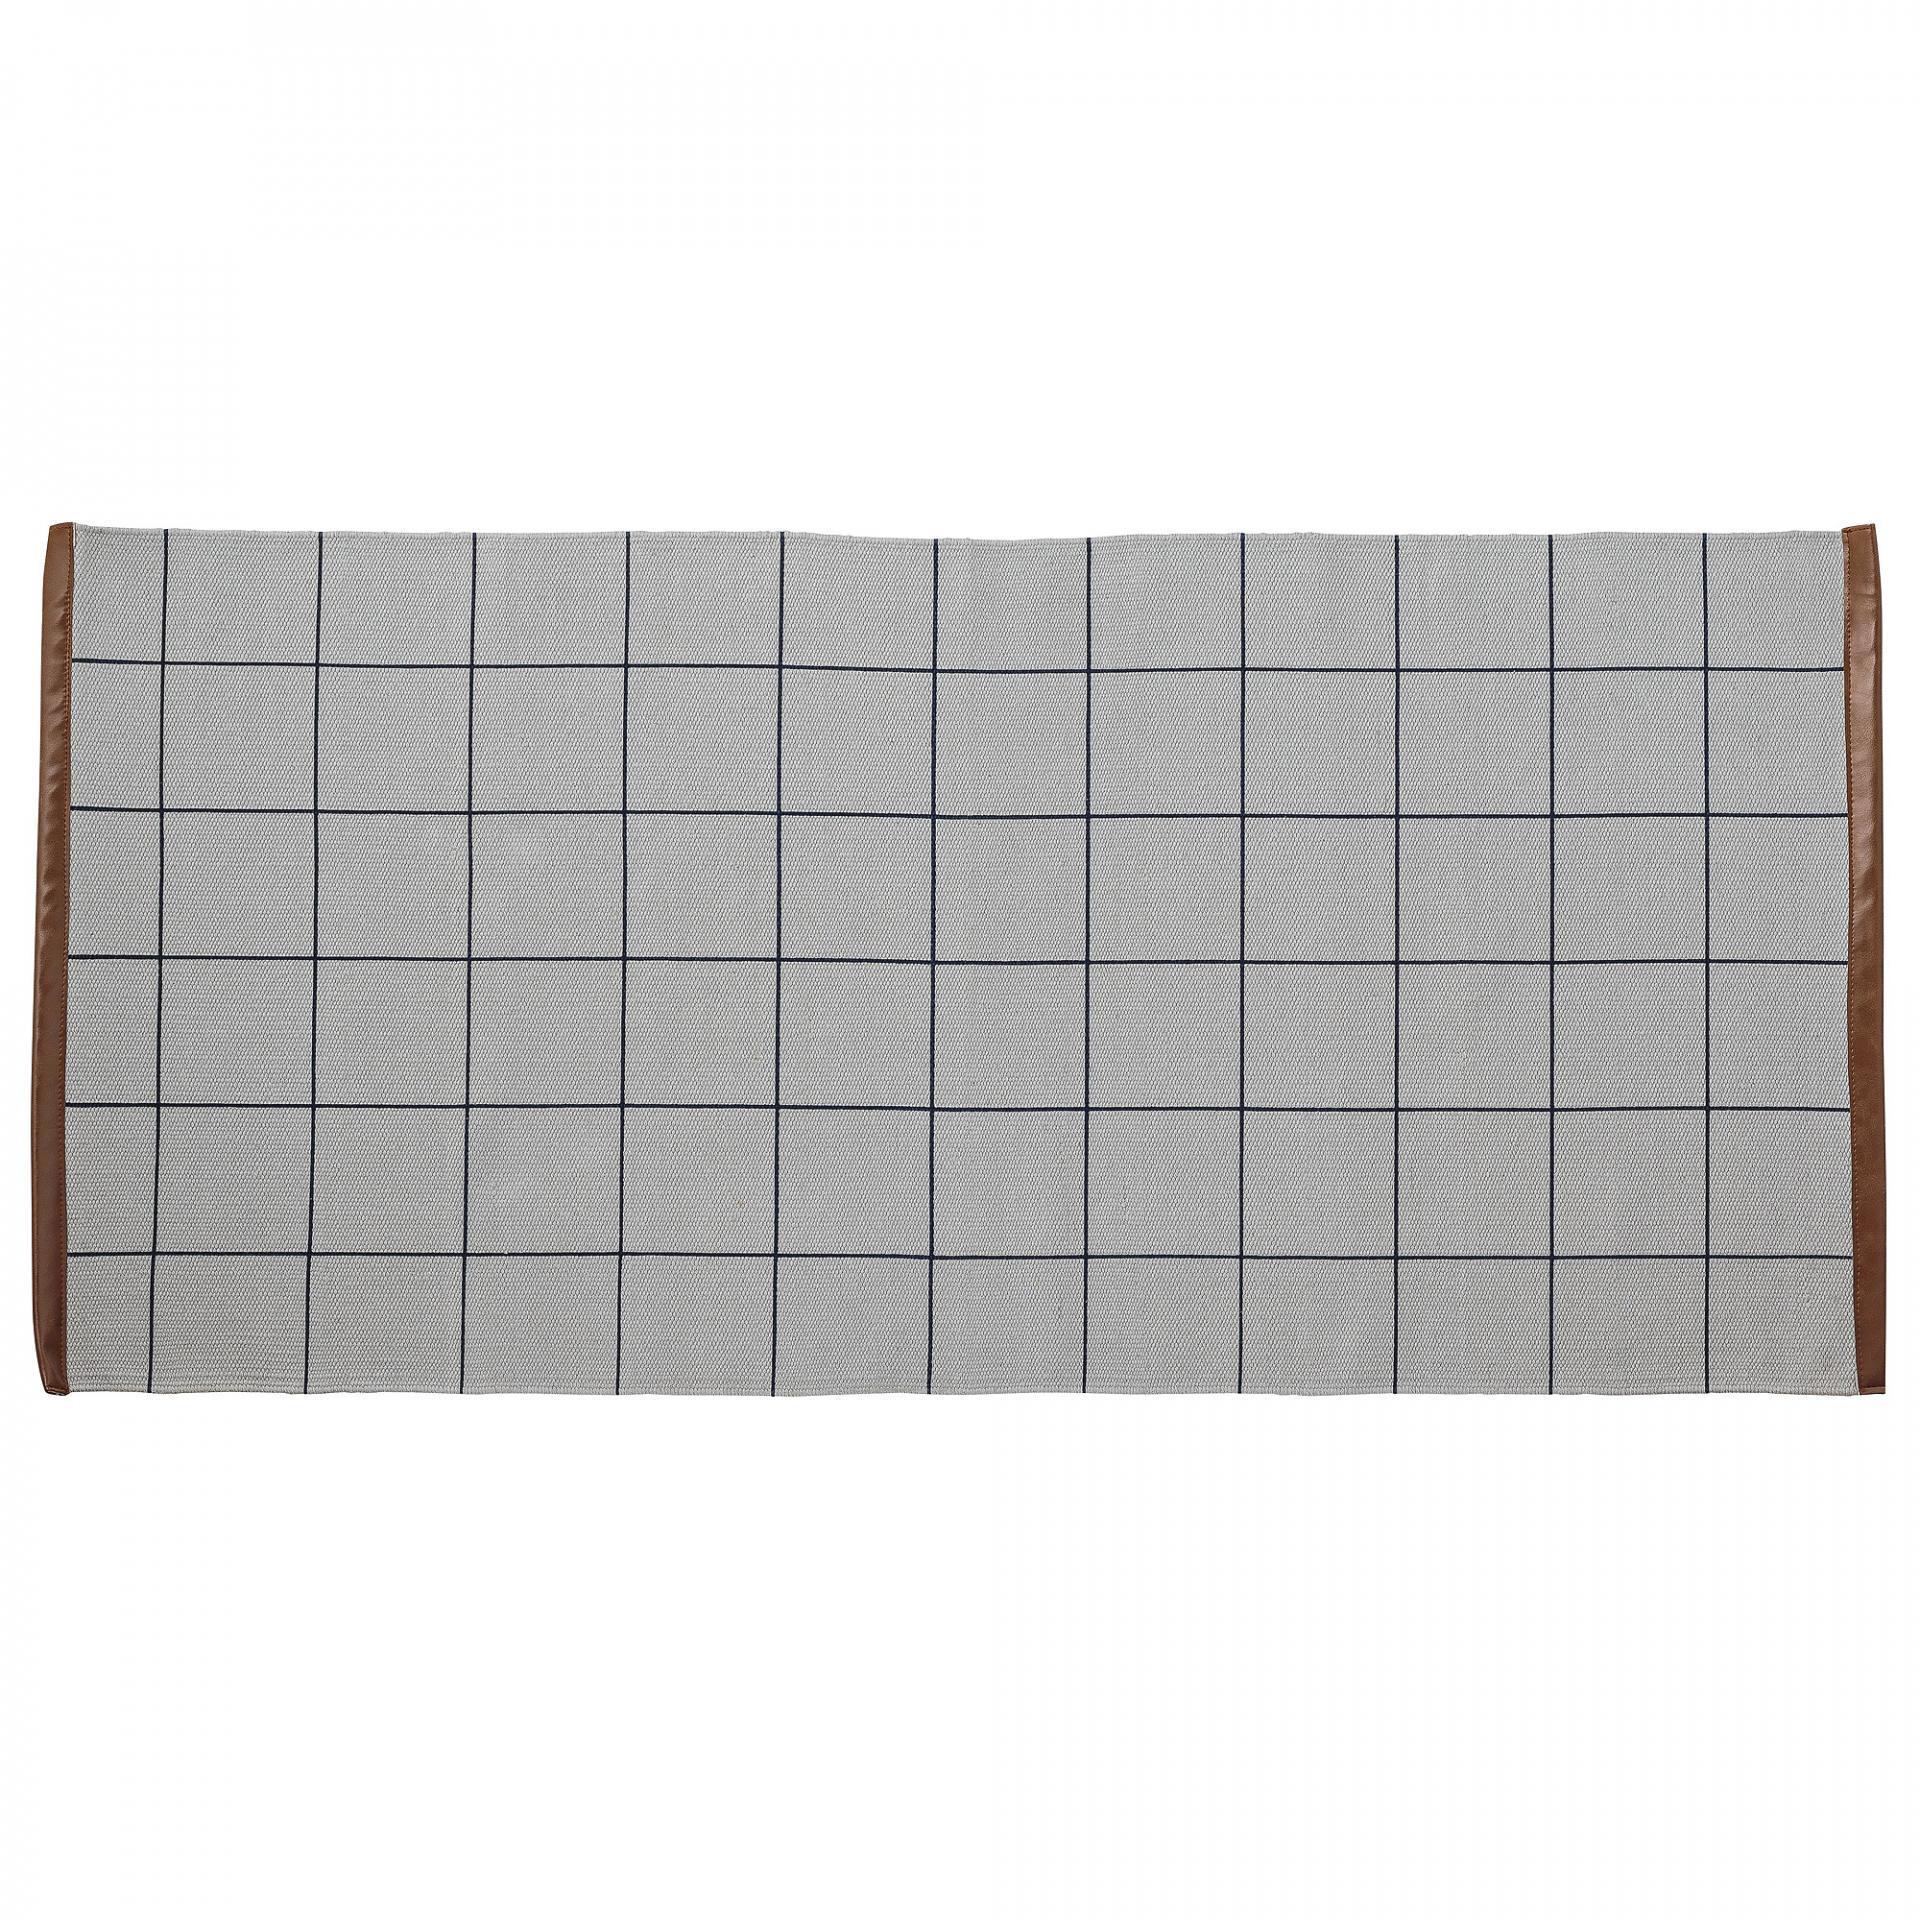 Bloomingville Bavlněný kobereček Cool Grey Checks, modrá barva, béžová barva, šedá barva, textil Šedá